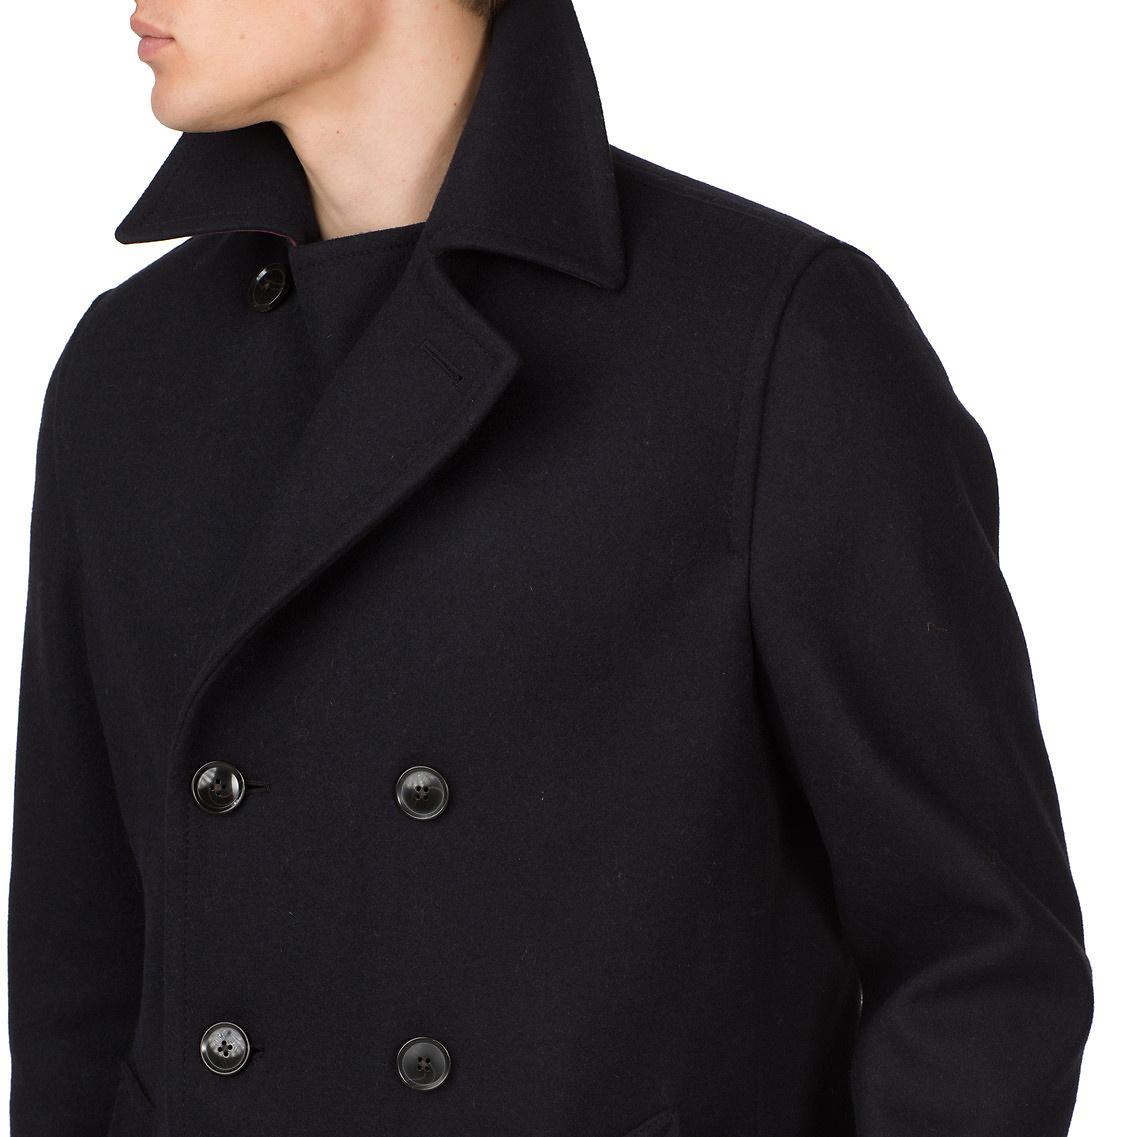 till salu plocka upp Storbritannien butik tommy hilfiger tommy pea coat 4d0b540a80 usa cheap sale ...